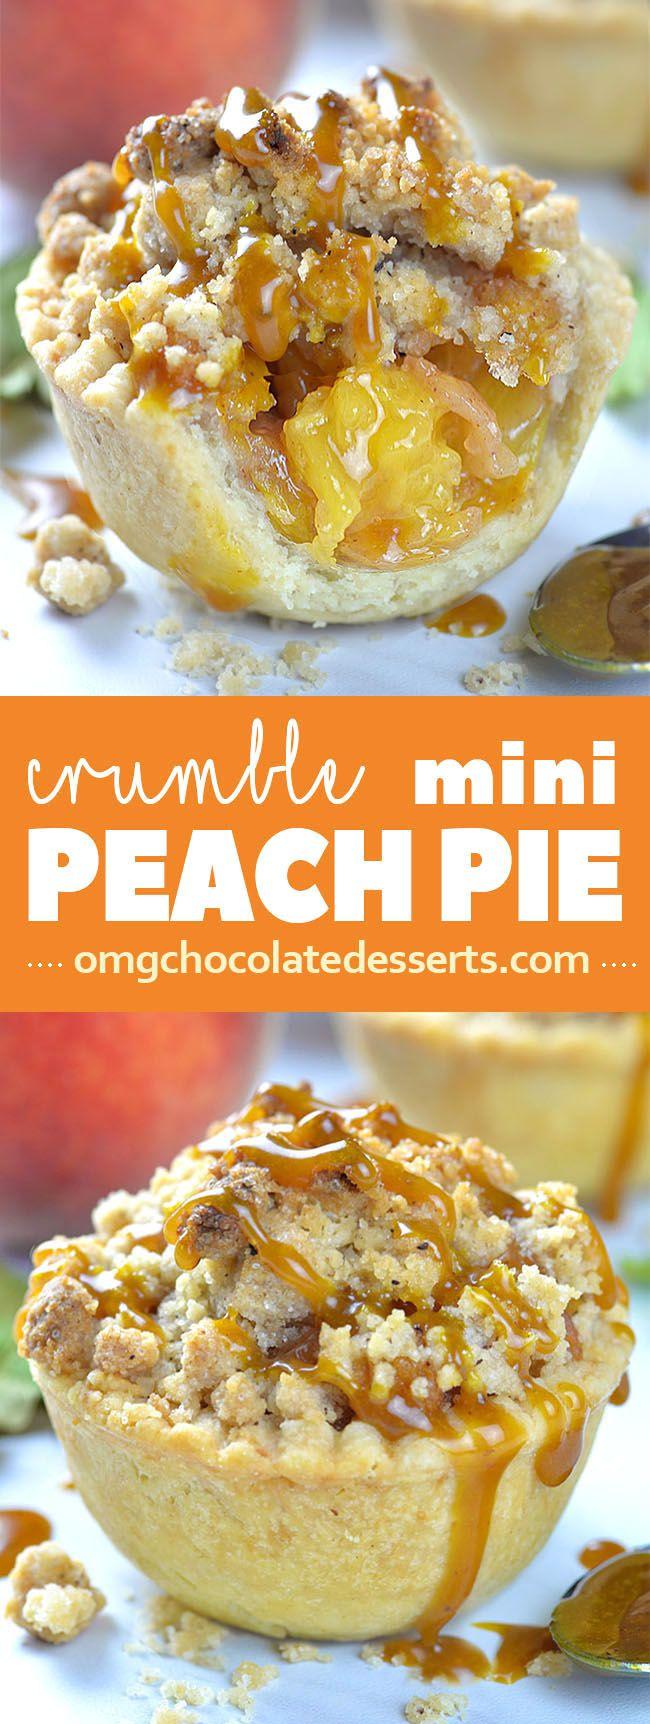 Crumble Mini Peach Pie Pine Creek Style